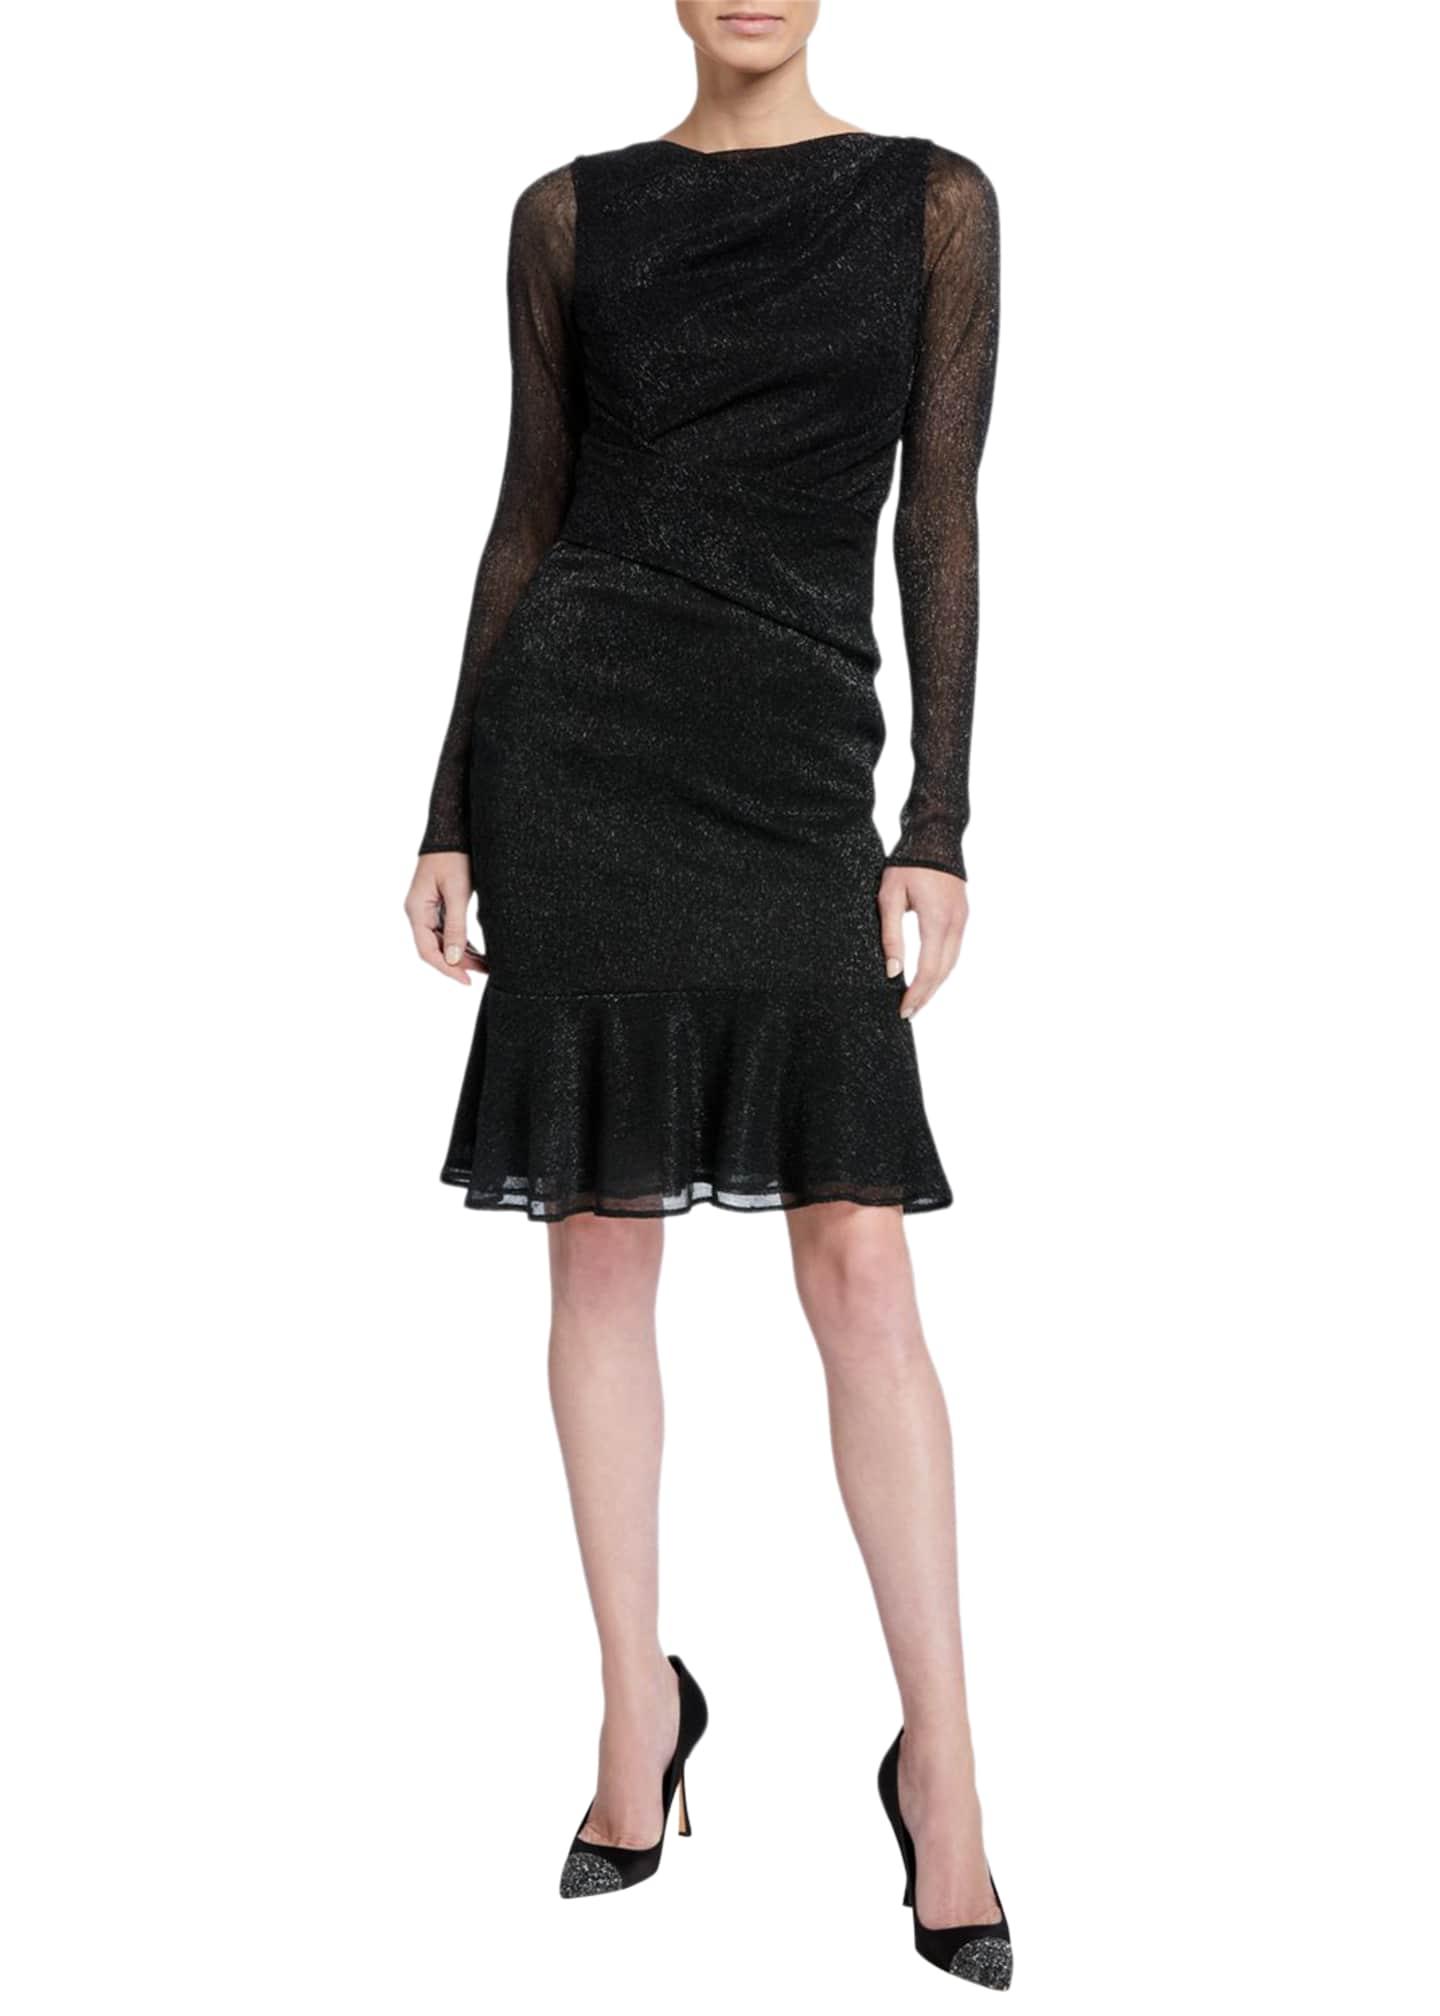 Talbot Runhof Metallic Long-Sleeve A-line Cocktail Dress